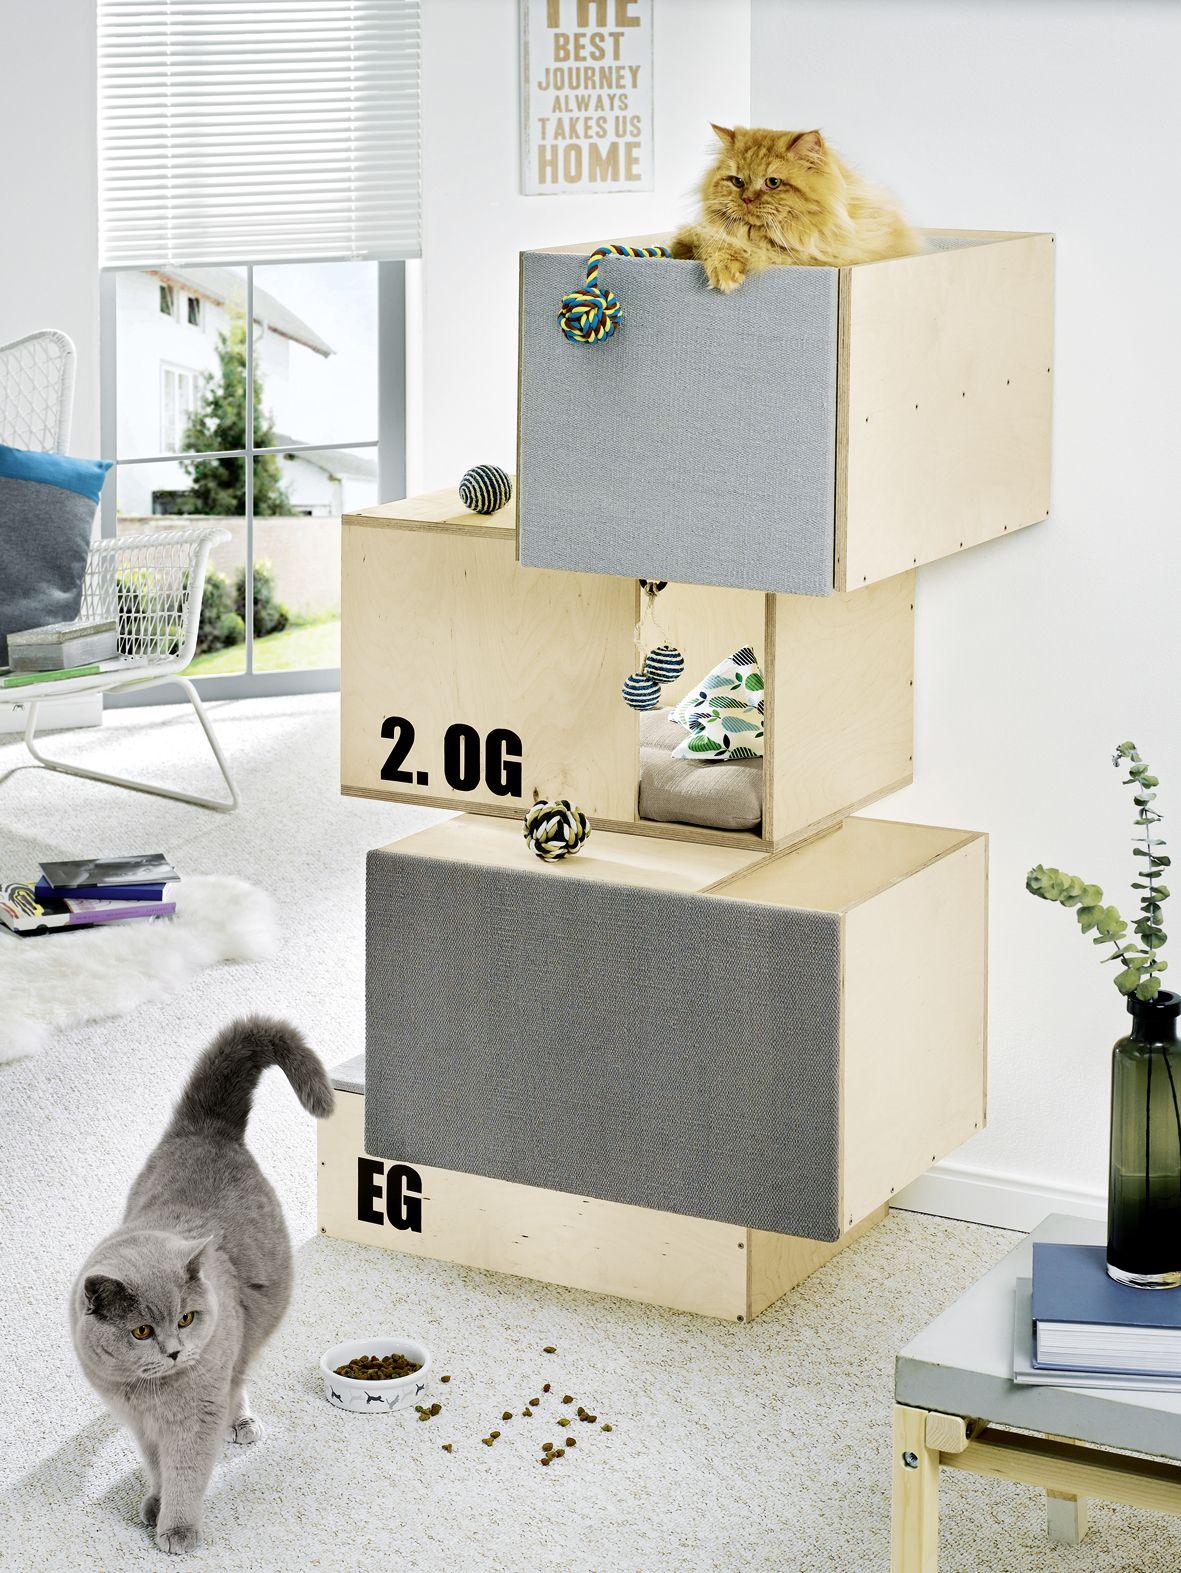 katzenm bel kubus h hle hier geht 39 s zur anleitung. Black Bedroom Furniture Sets. Home Design Ideas